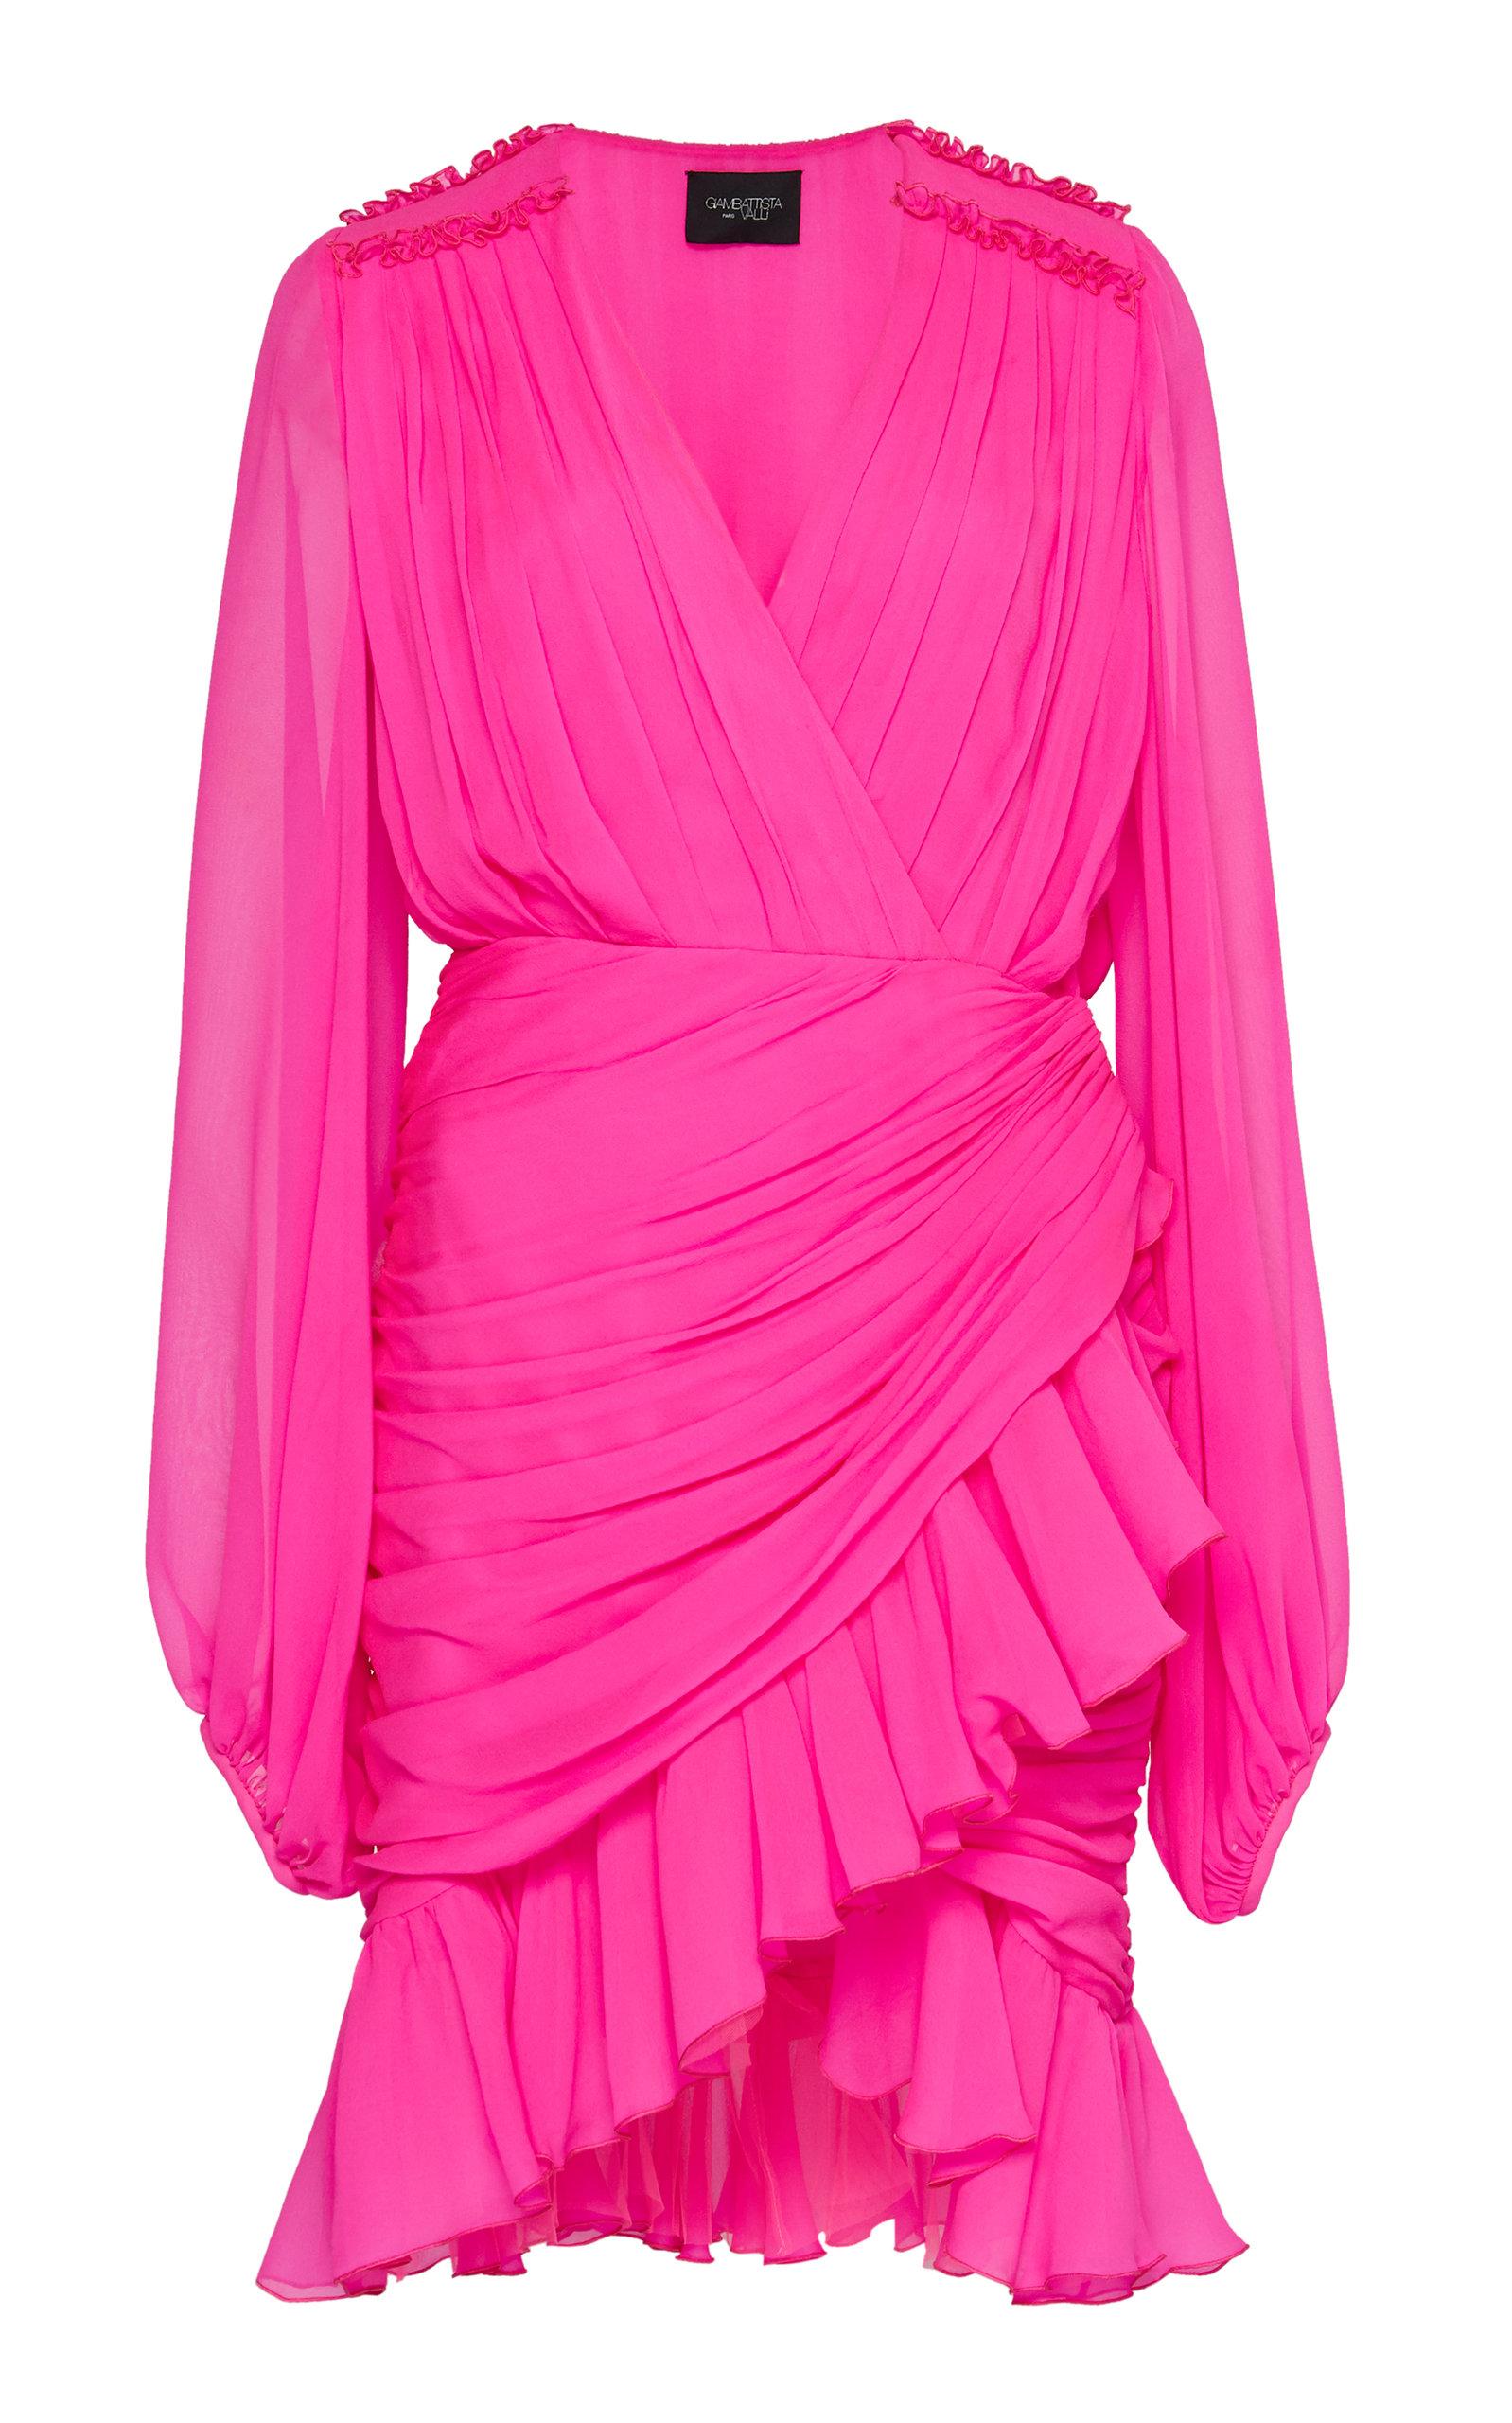 Giambattista Valli Dresses Ruched Neon Silk-Chiffon Mini Dress